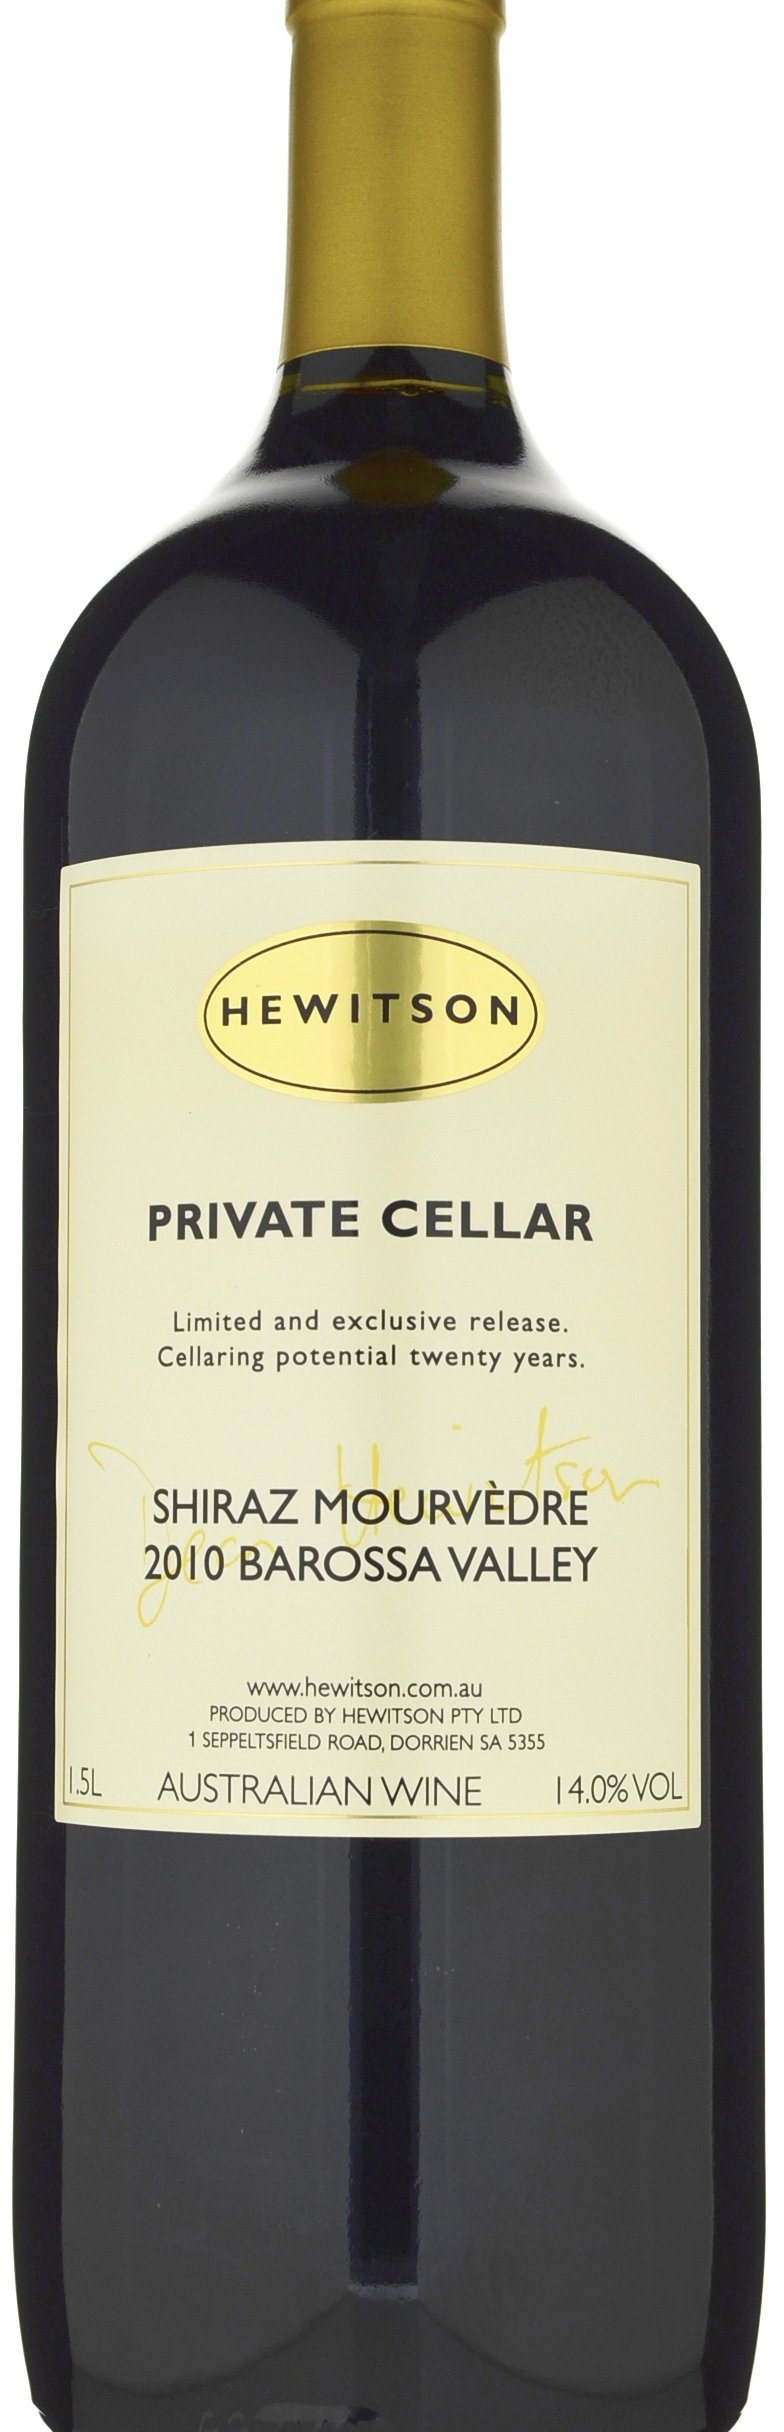 Hewitson 'Private Cellar' Shiraz-Mourvedre 2005-2329